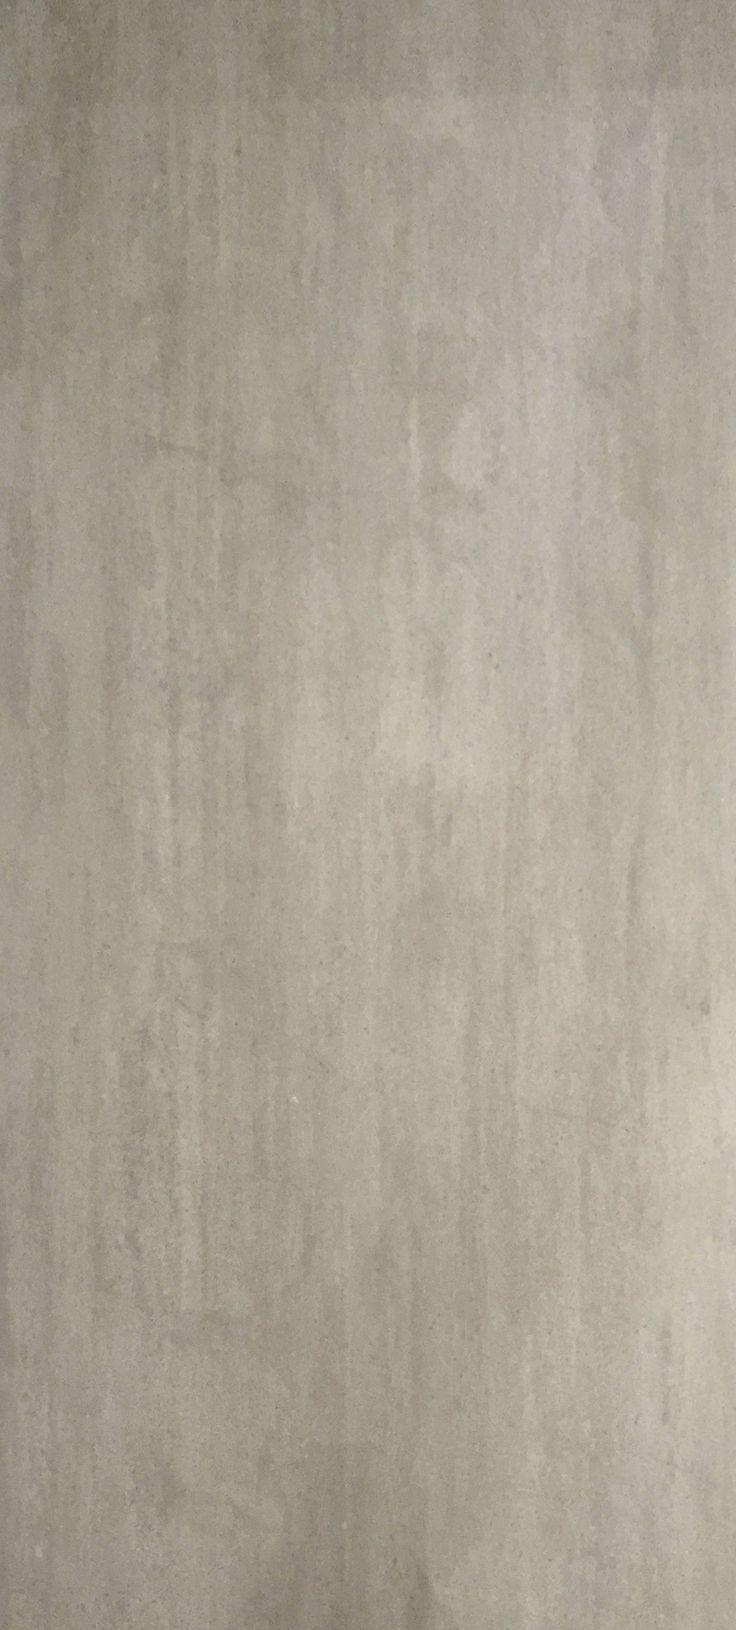 Personal Selection Bathroom Floor or Wall Tile - Mark Chrome Lap